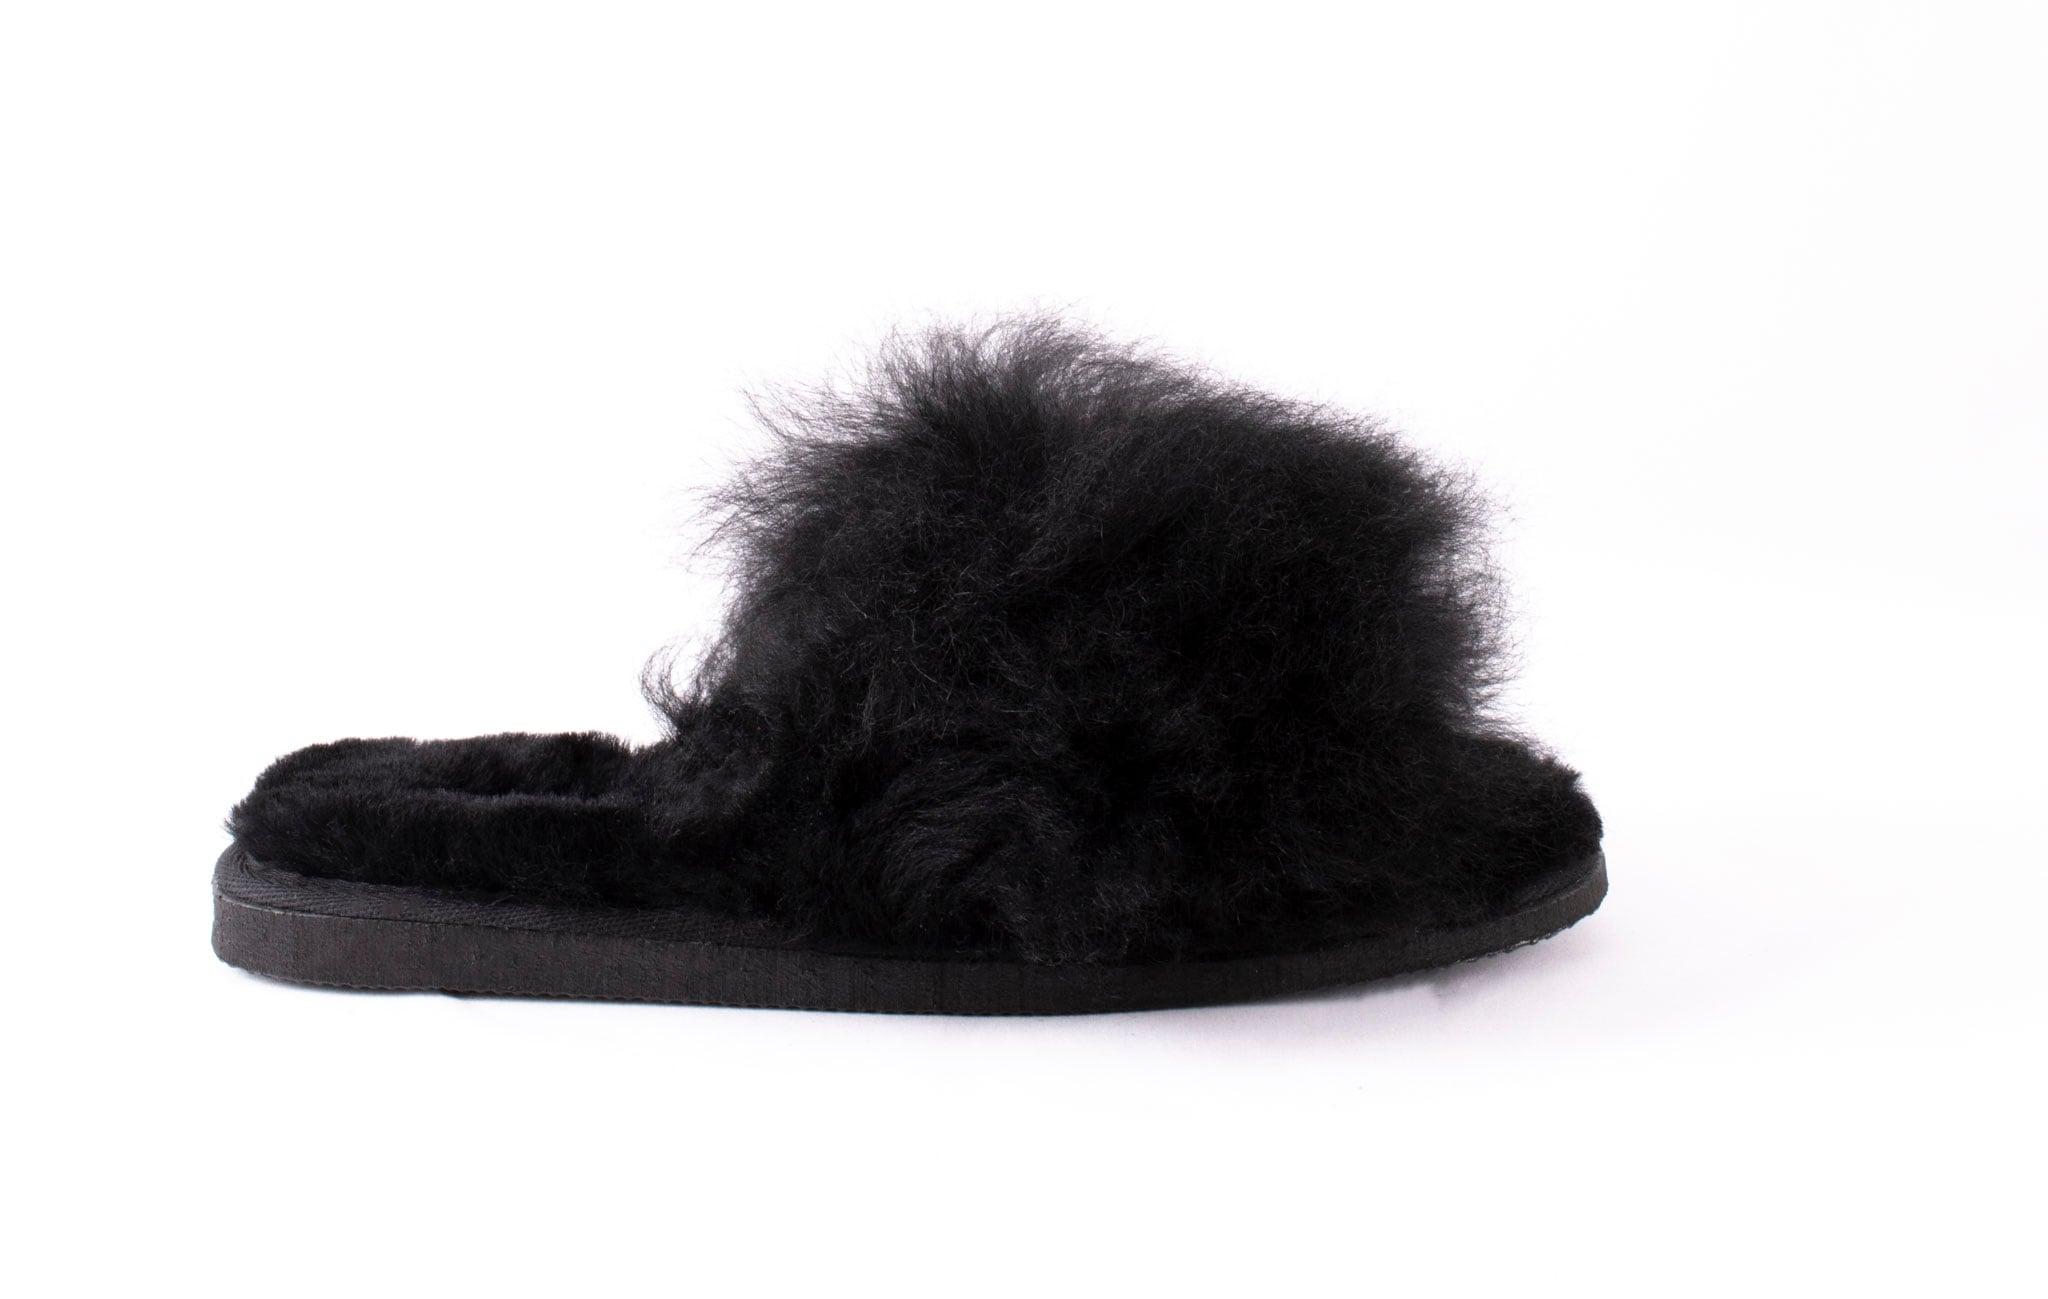 Tessan slippers